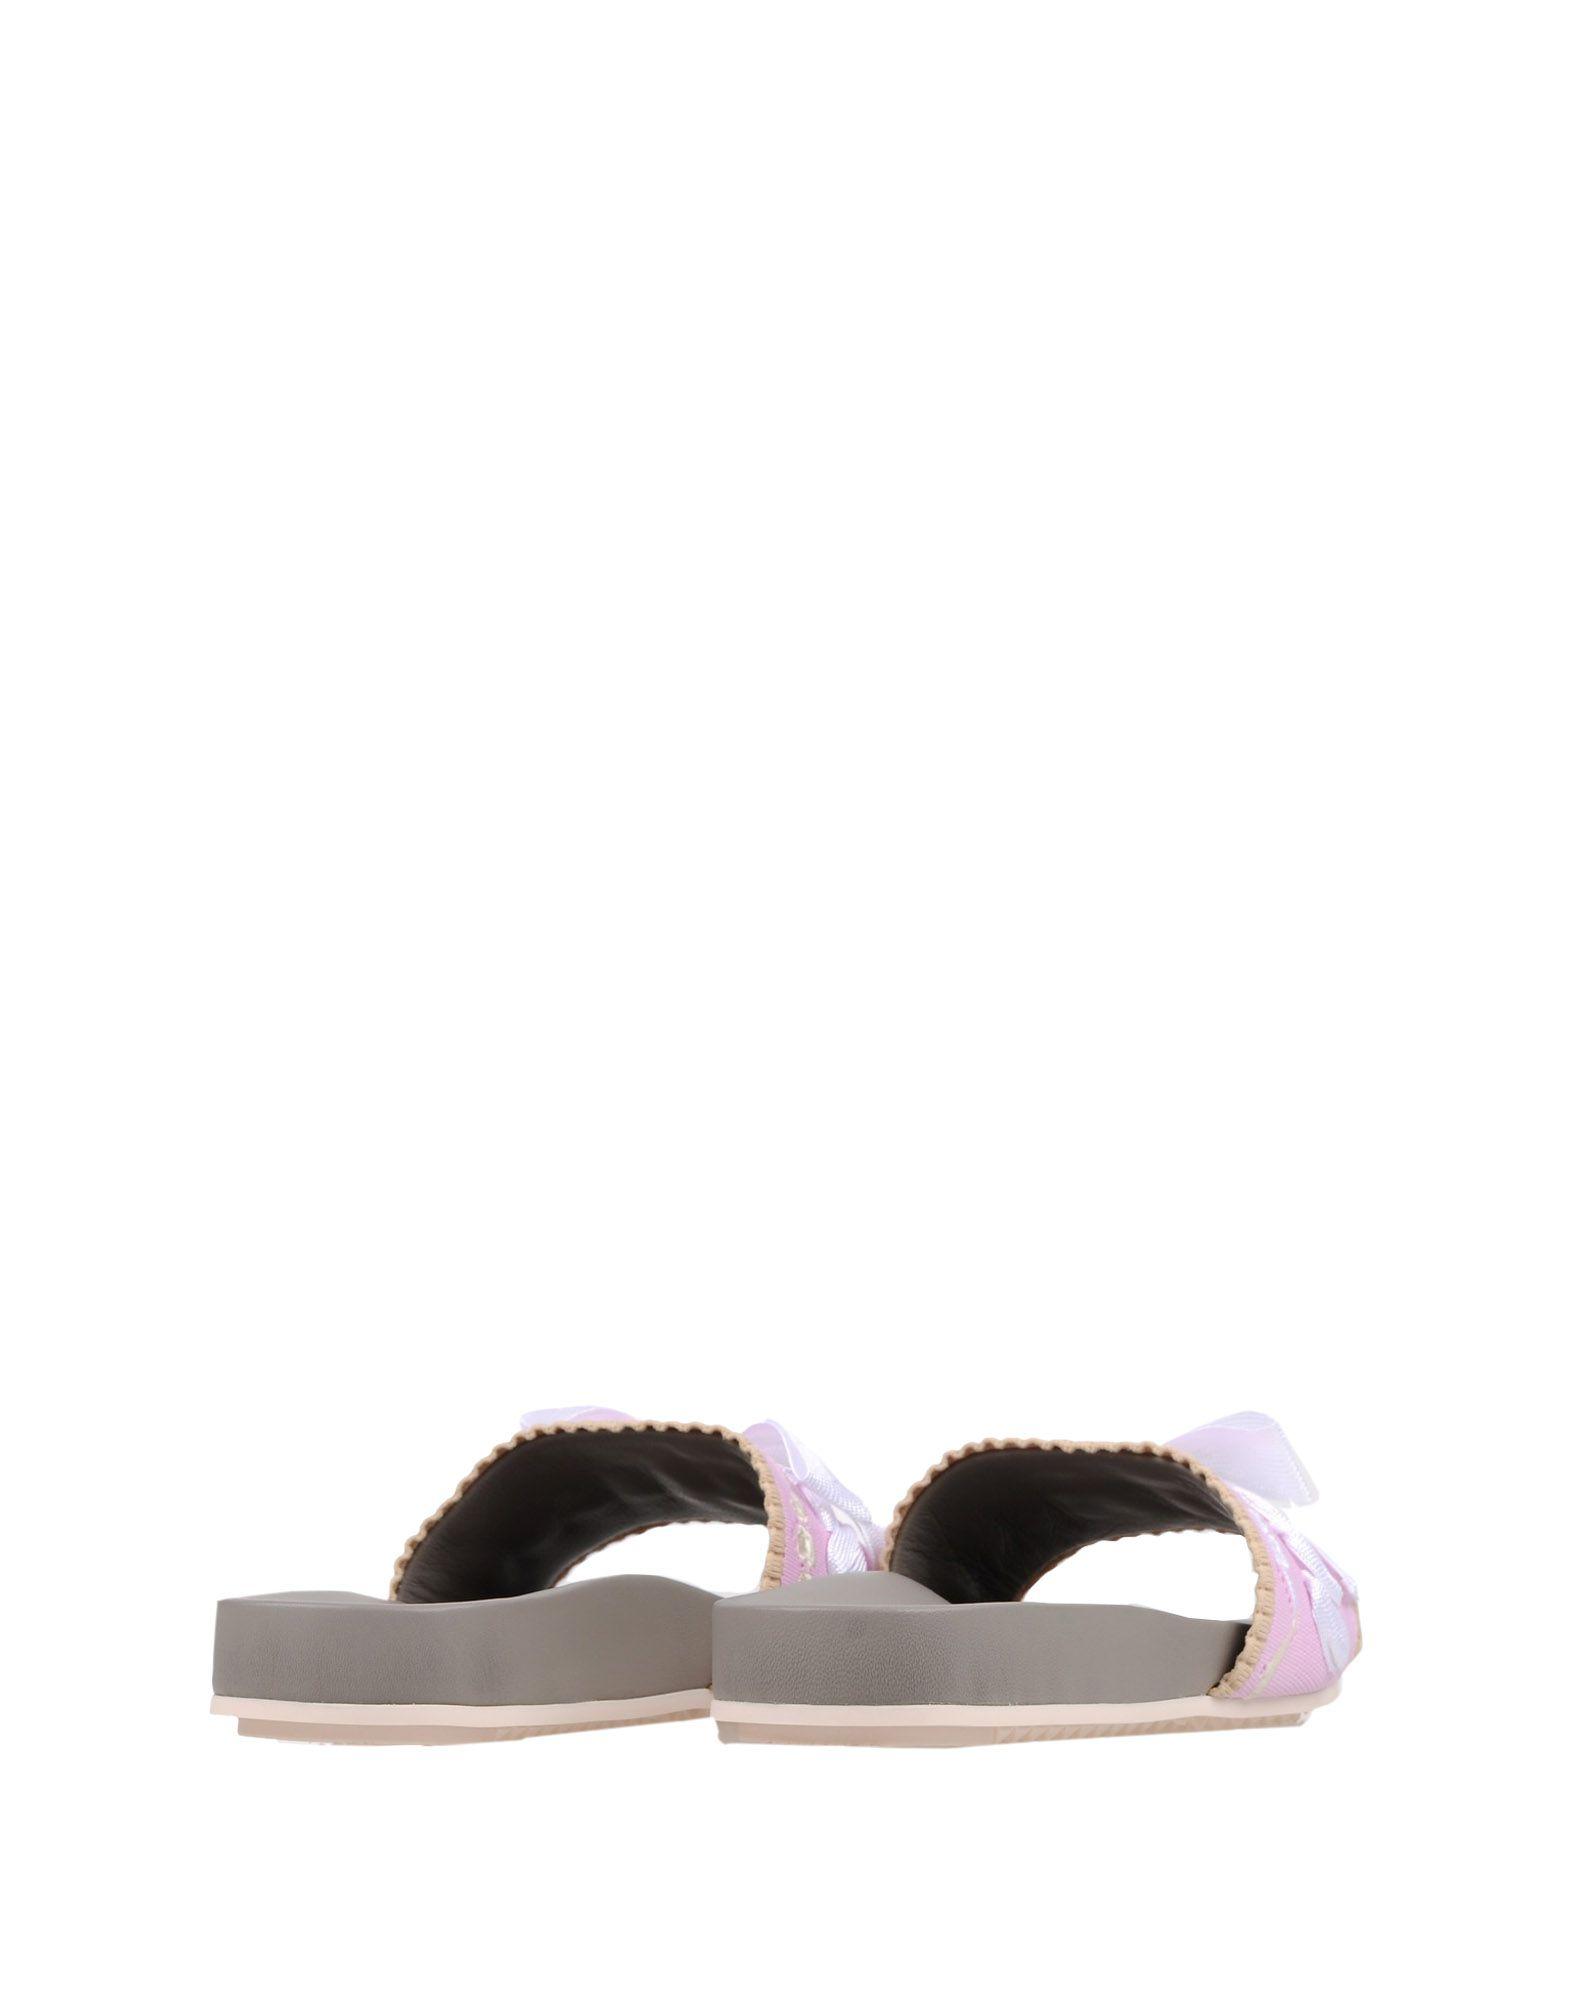 Fendi strapazierfähige Sandalen Damen  11329509MMGut aussehende strapazierfähige Fendi Schuhe 28565c